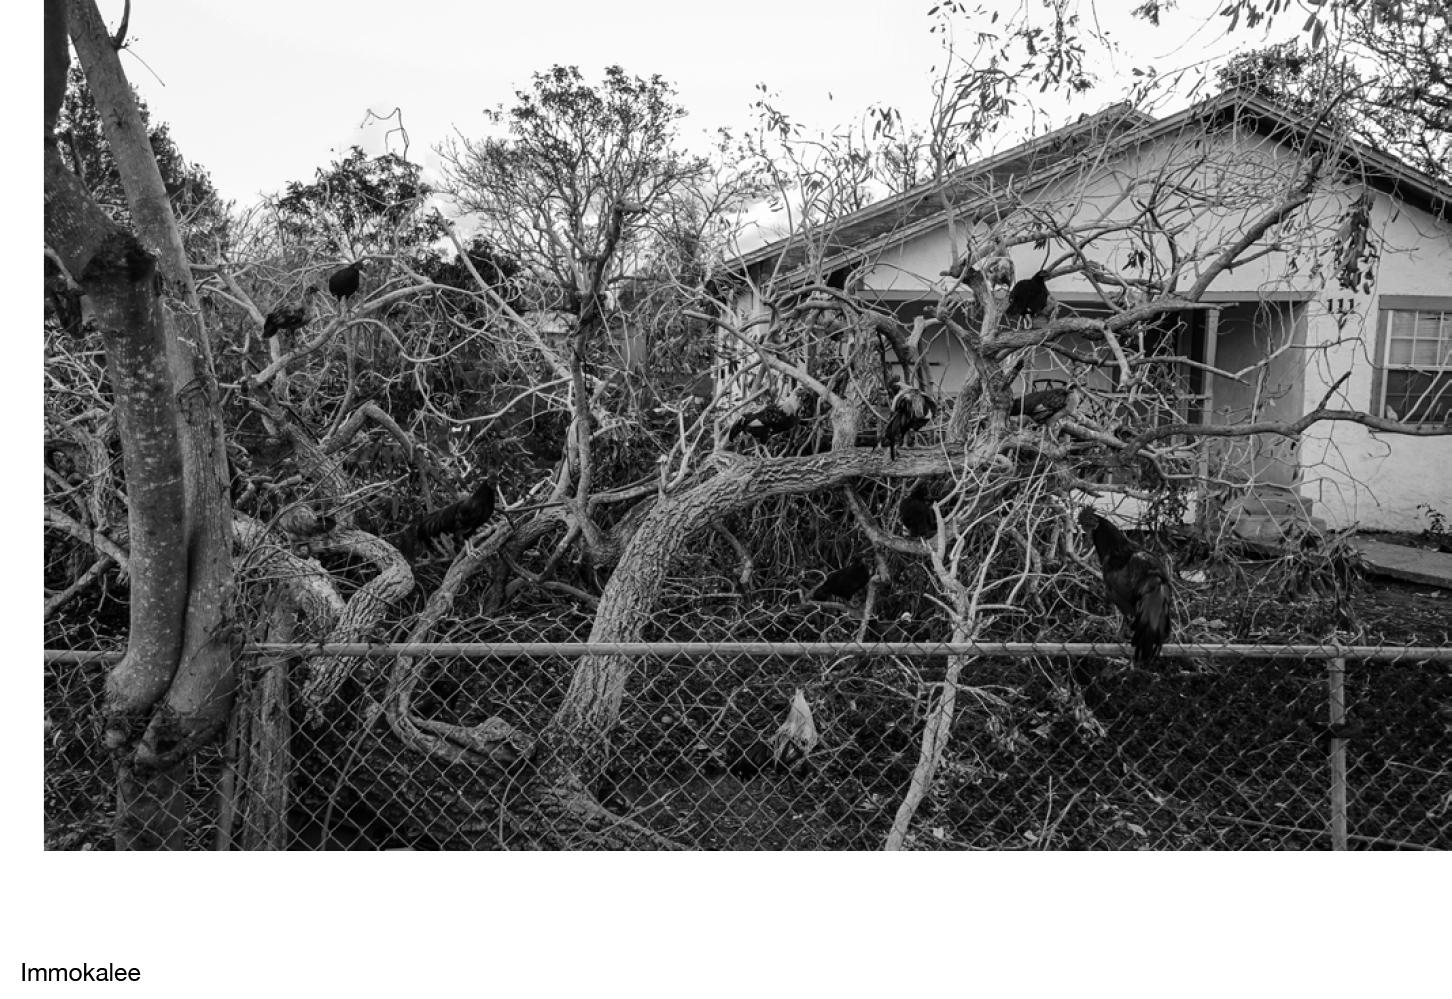 Robert LeBlanc Hurricane Irma %22Welcome To Paradise%22-25.jpg